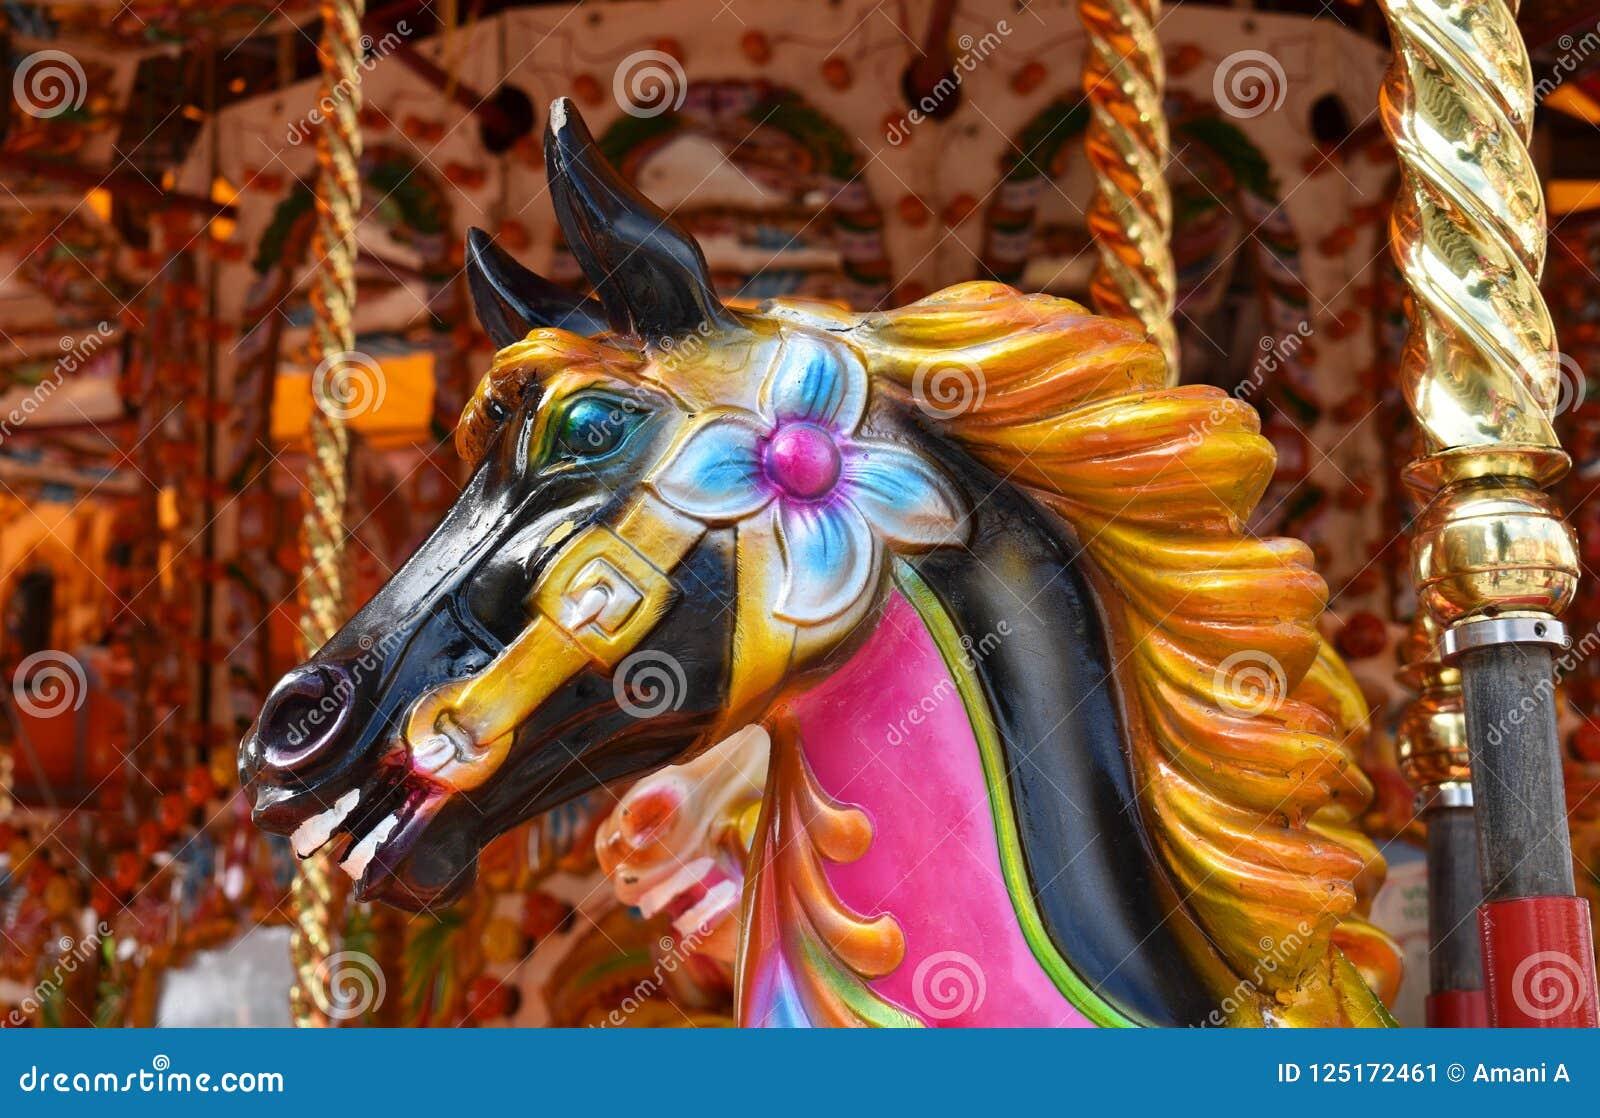 Carousel Horse Stock Image Image Of Authentic Enjoyment 125172461